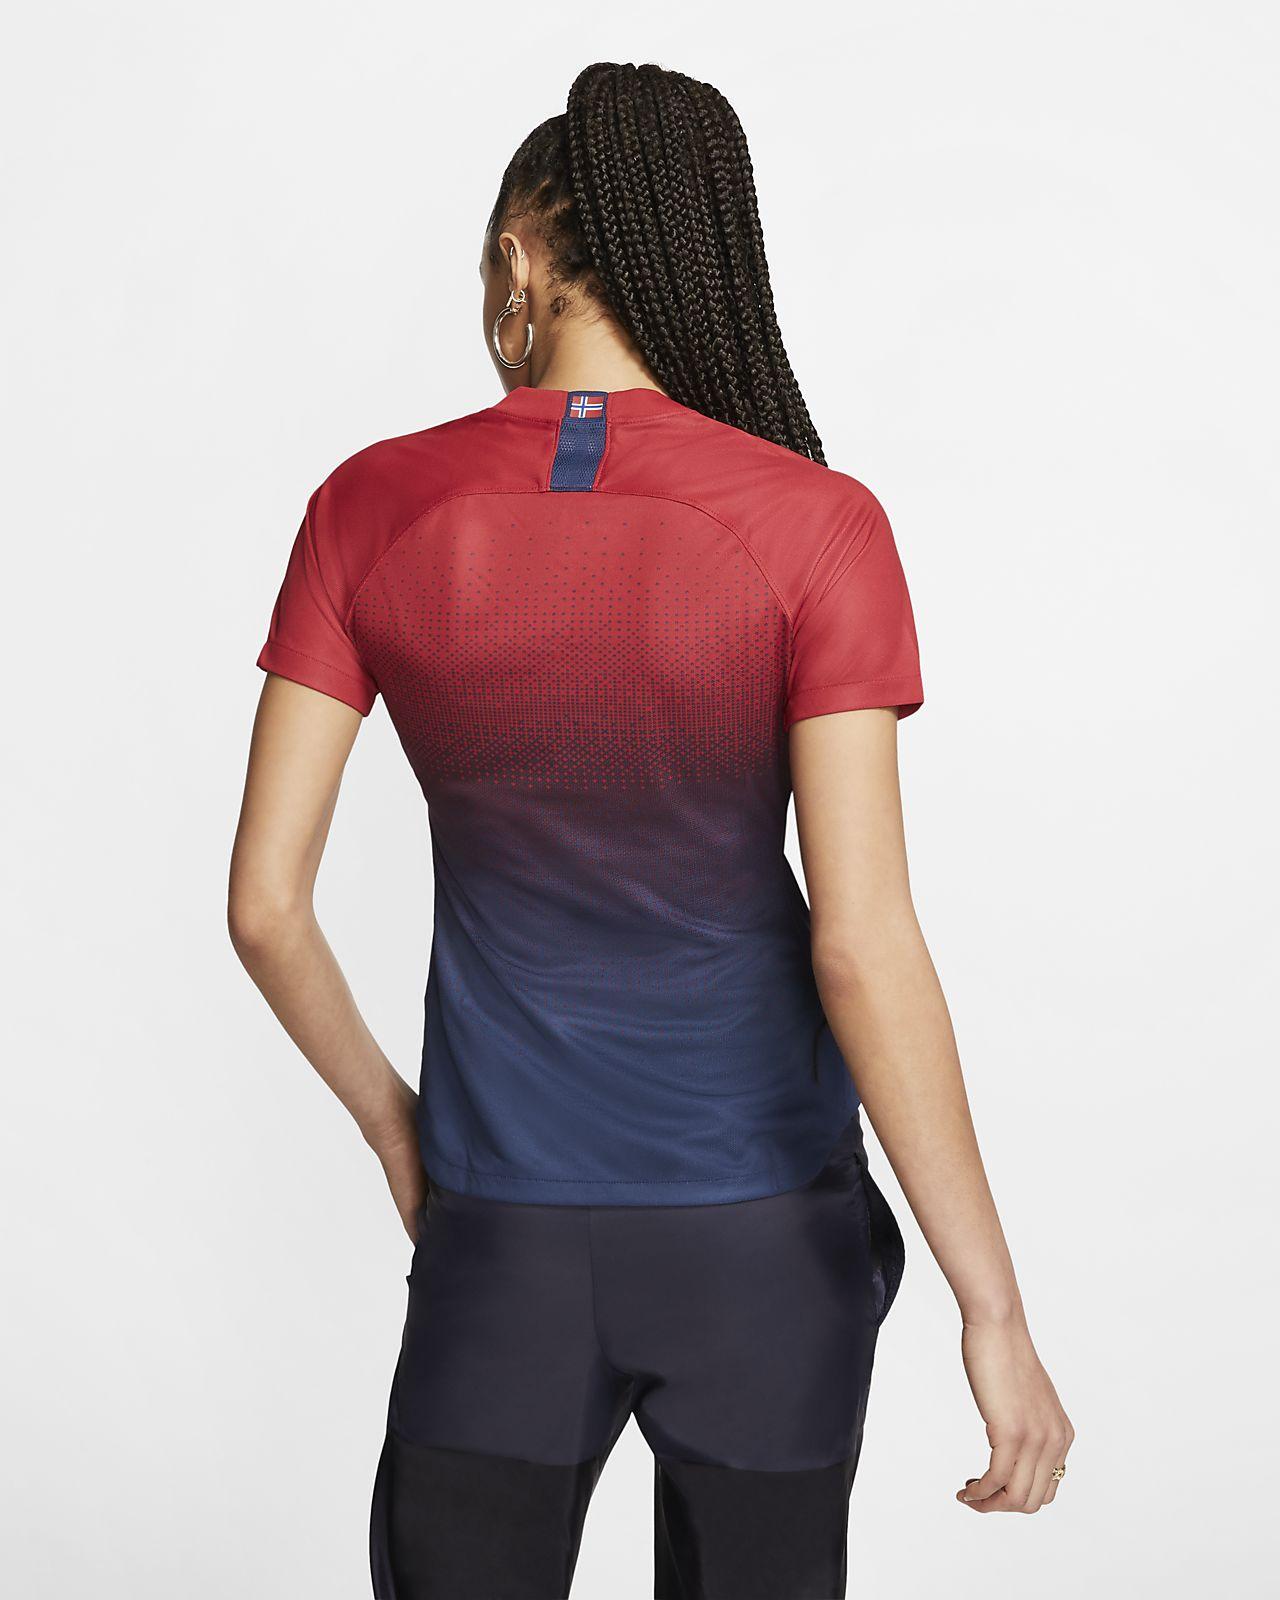 eab8f3d87 Norway 2019 Stadium Home Women s Football Shirt. Nike.com AU